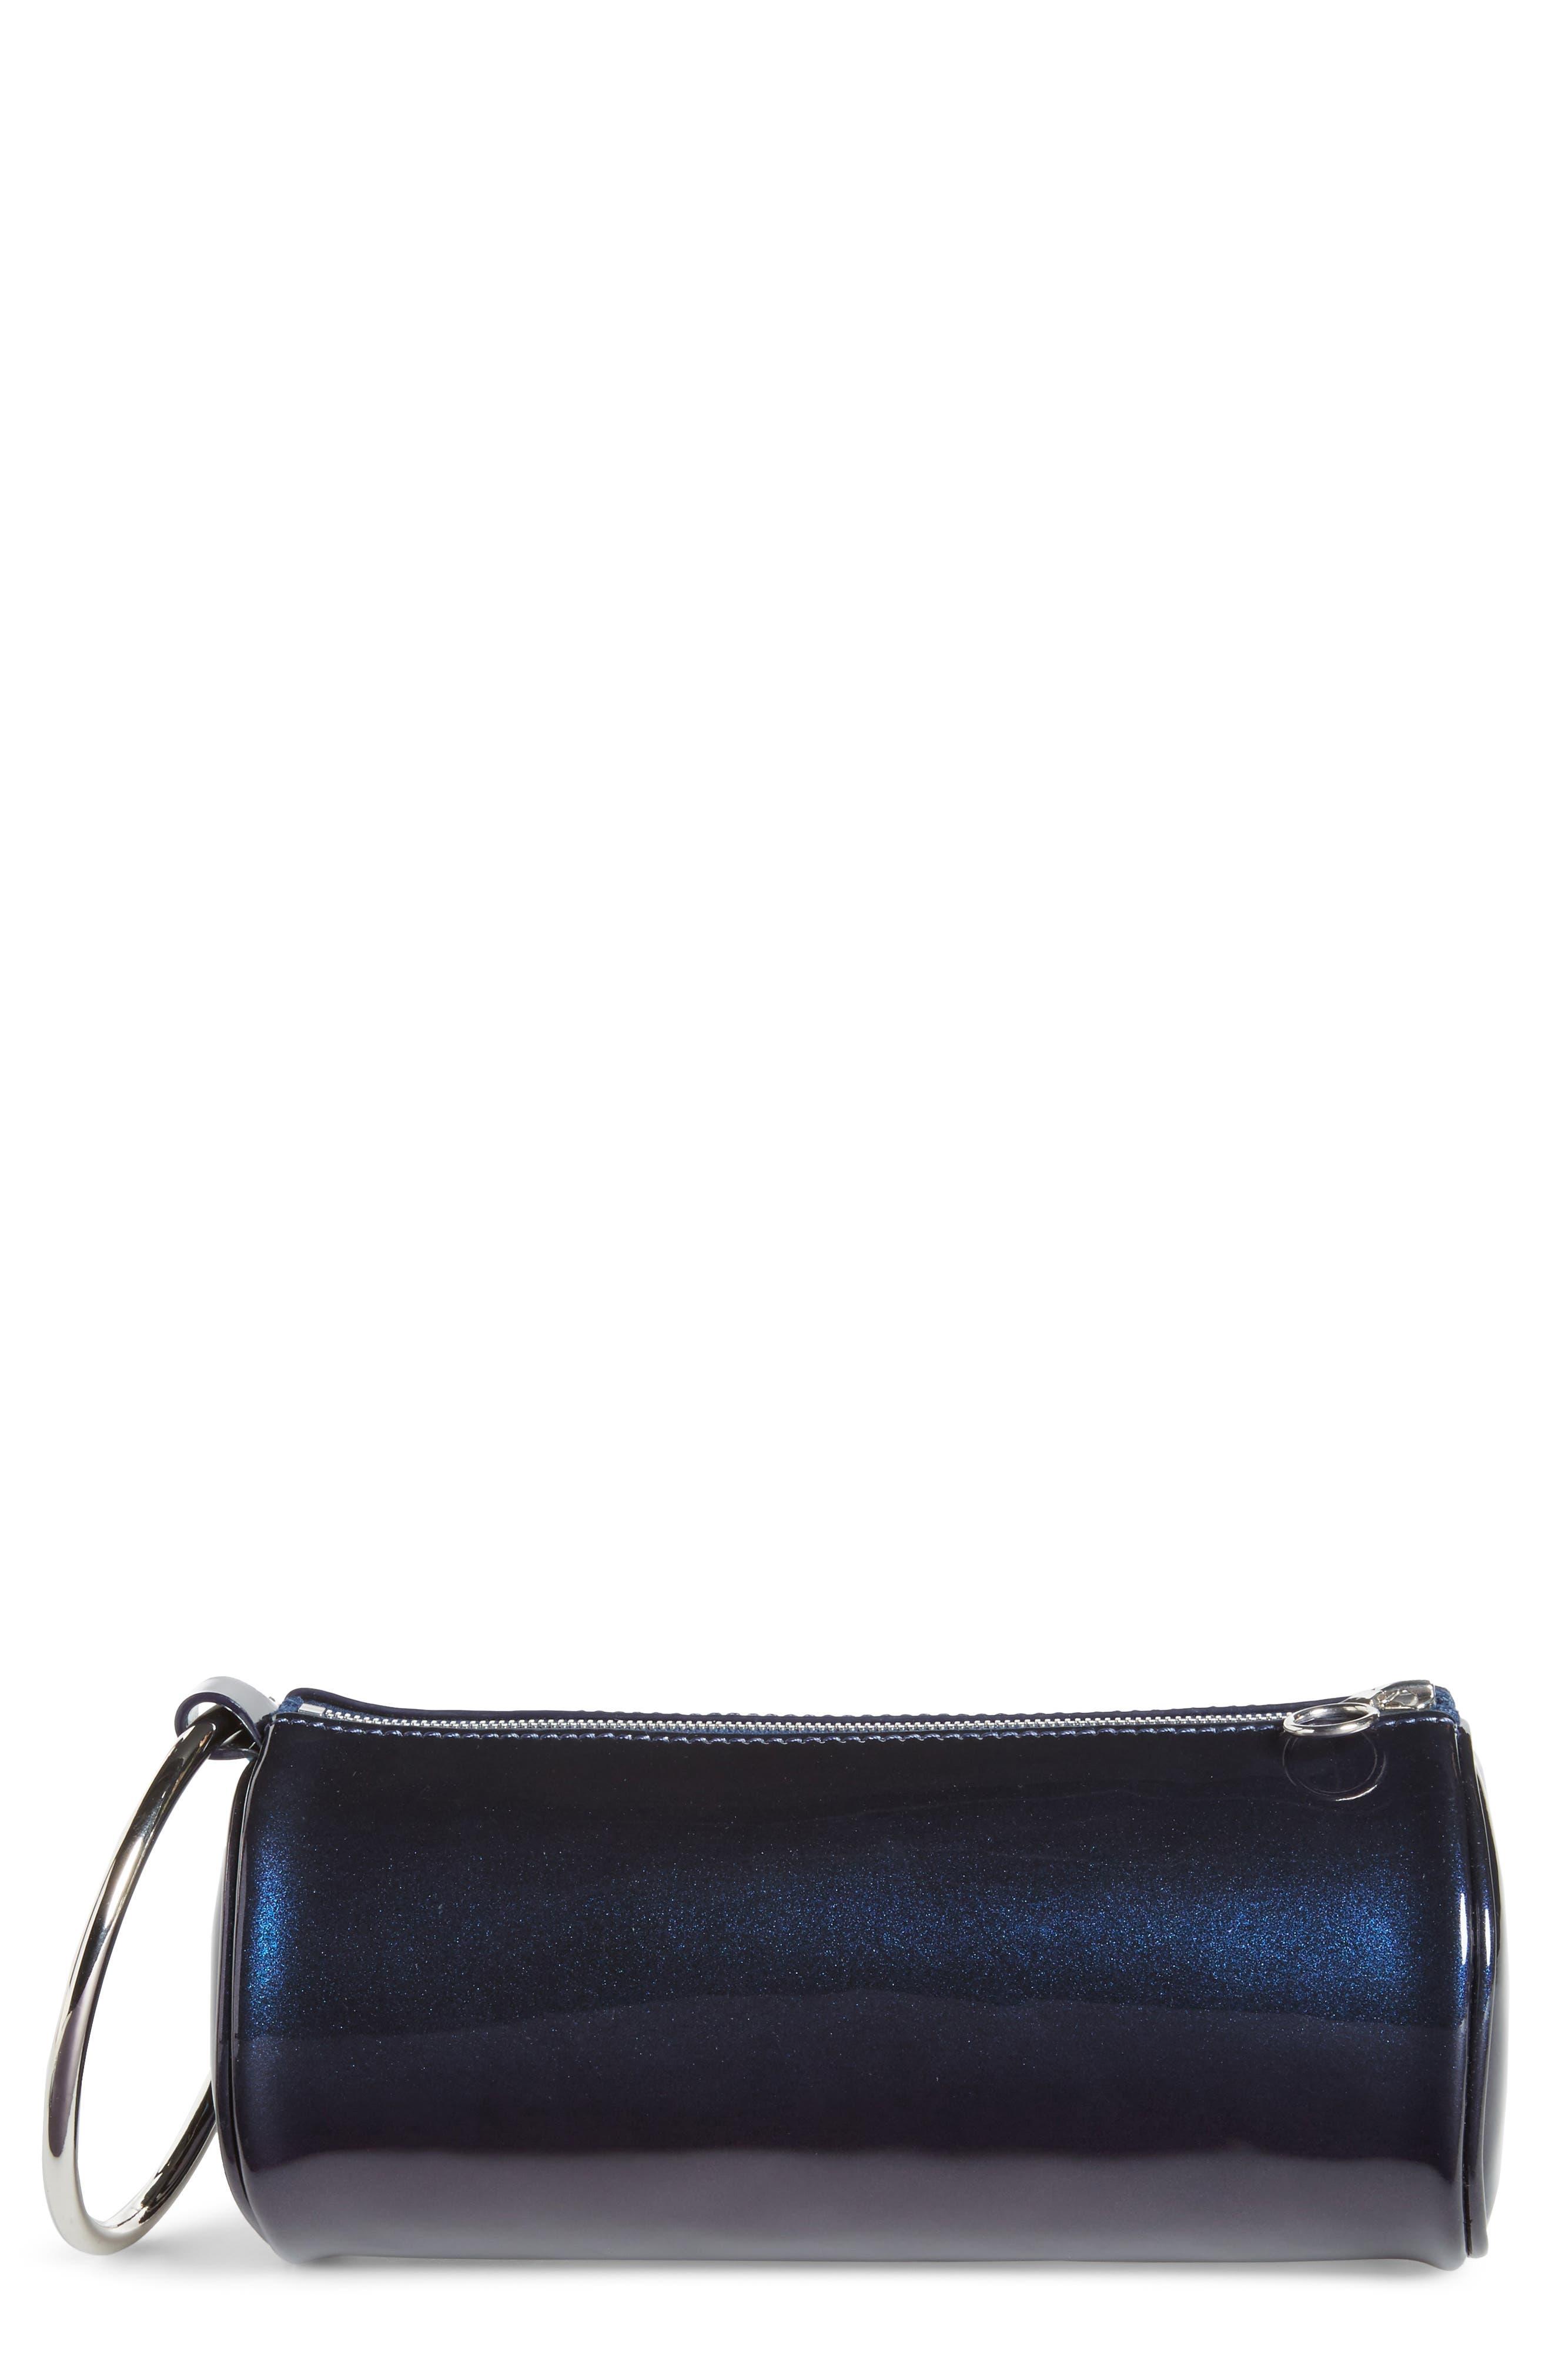 Iridescent Leather Duffel Wristlet Clutch,                             Main thumbnail 1, color,